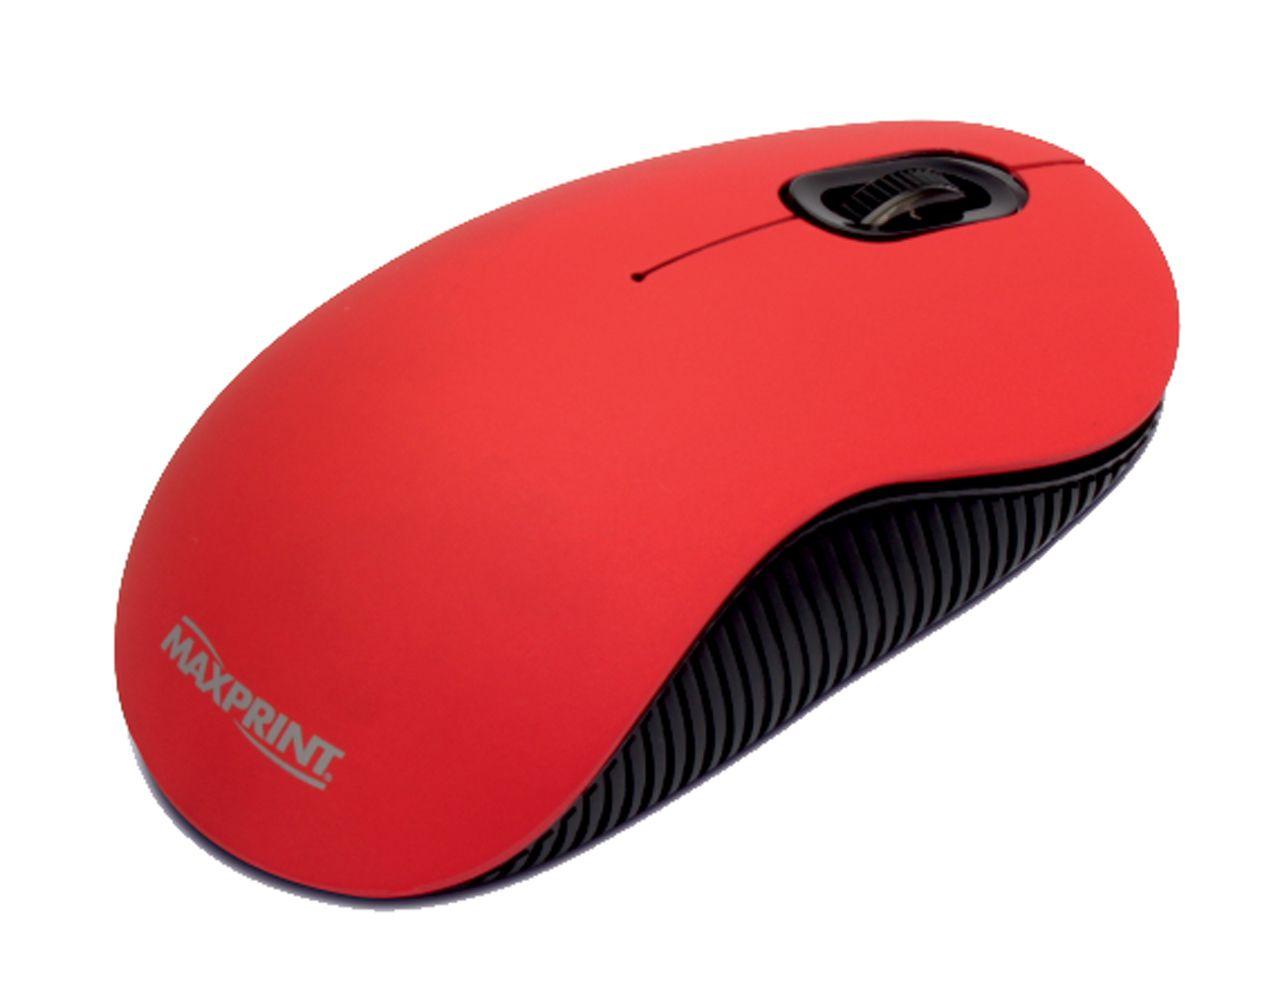 Mouse Óptico USB Emborrachado Maxprint Vermelho 1000 DPI